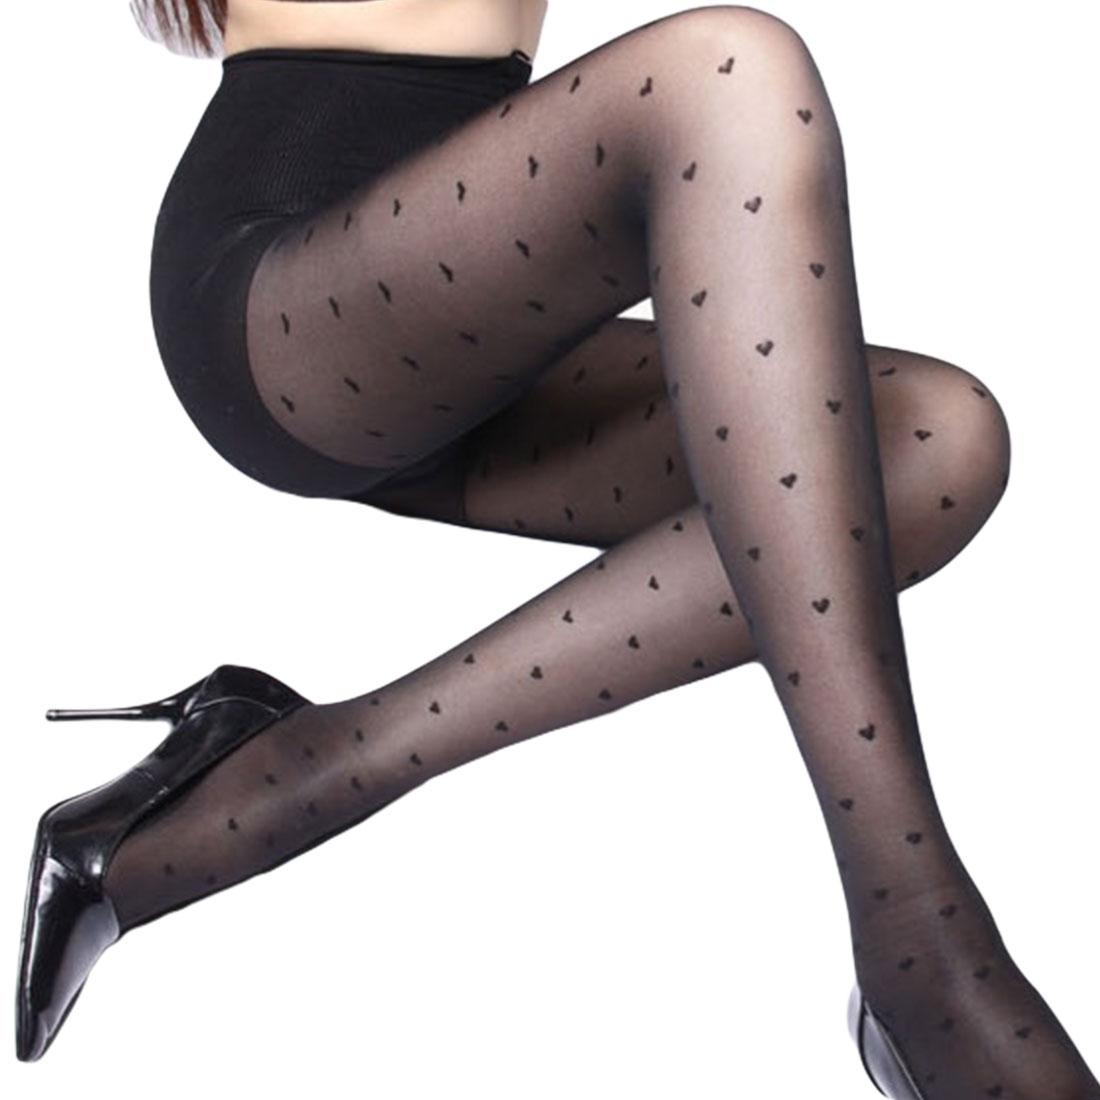 2019 Women Sexy Tights Stockings Female Love Heart Transparent Pantyhose Black Stocking Microfiber Acrylic Hot Sale Dropship